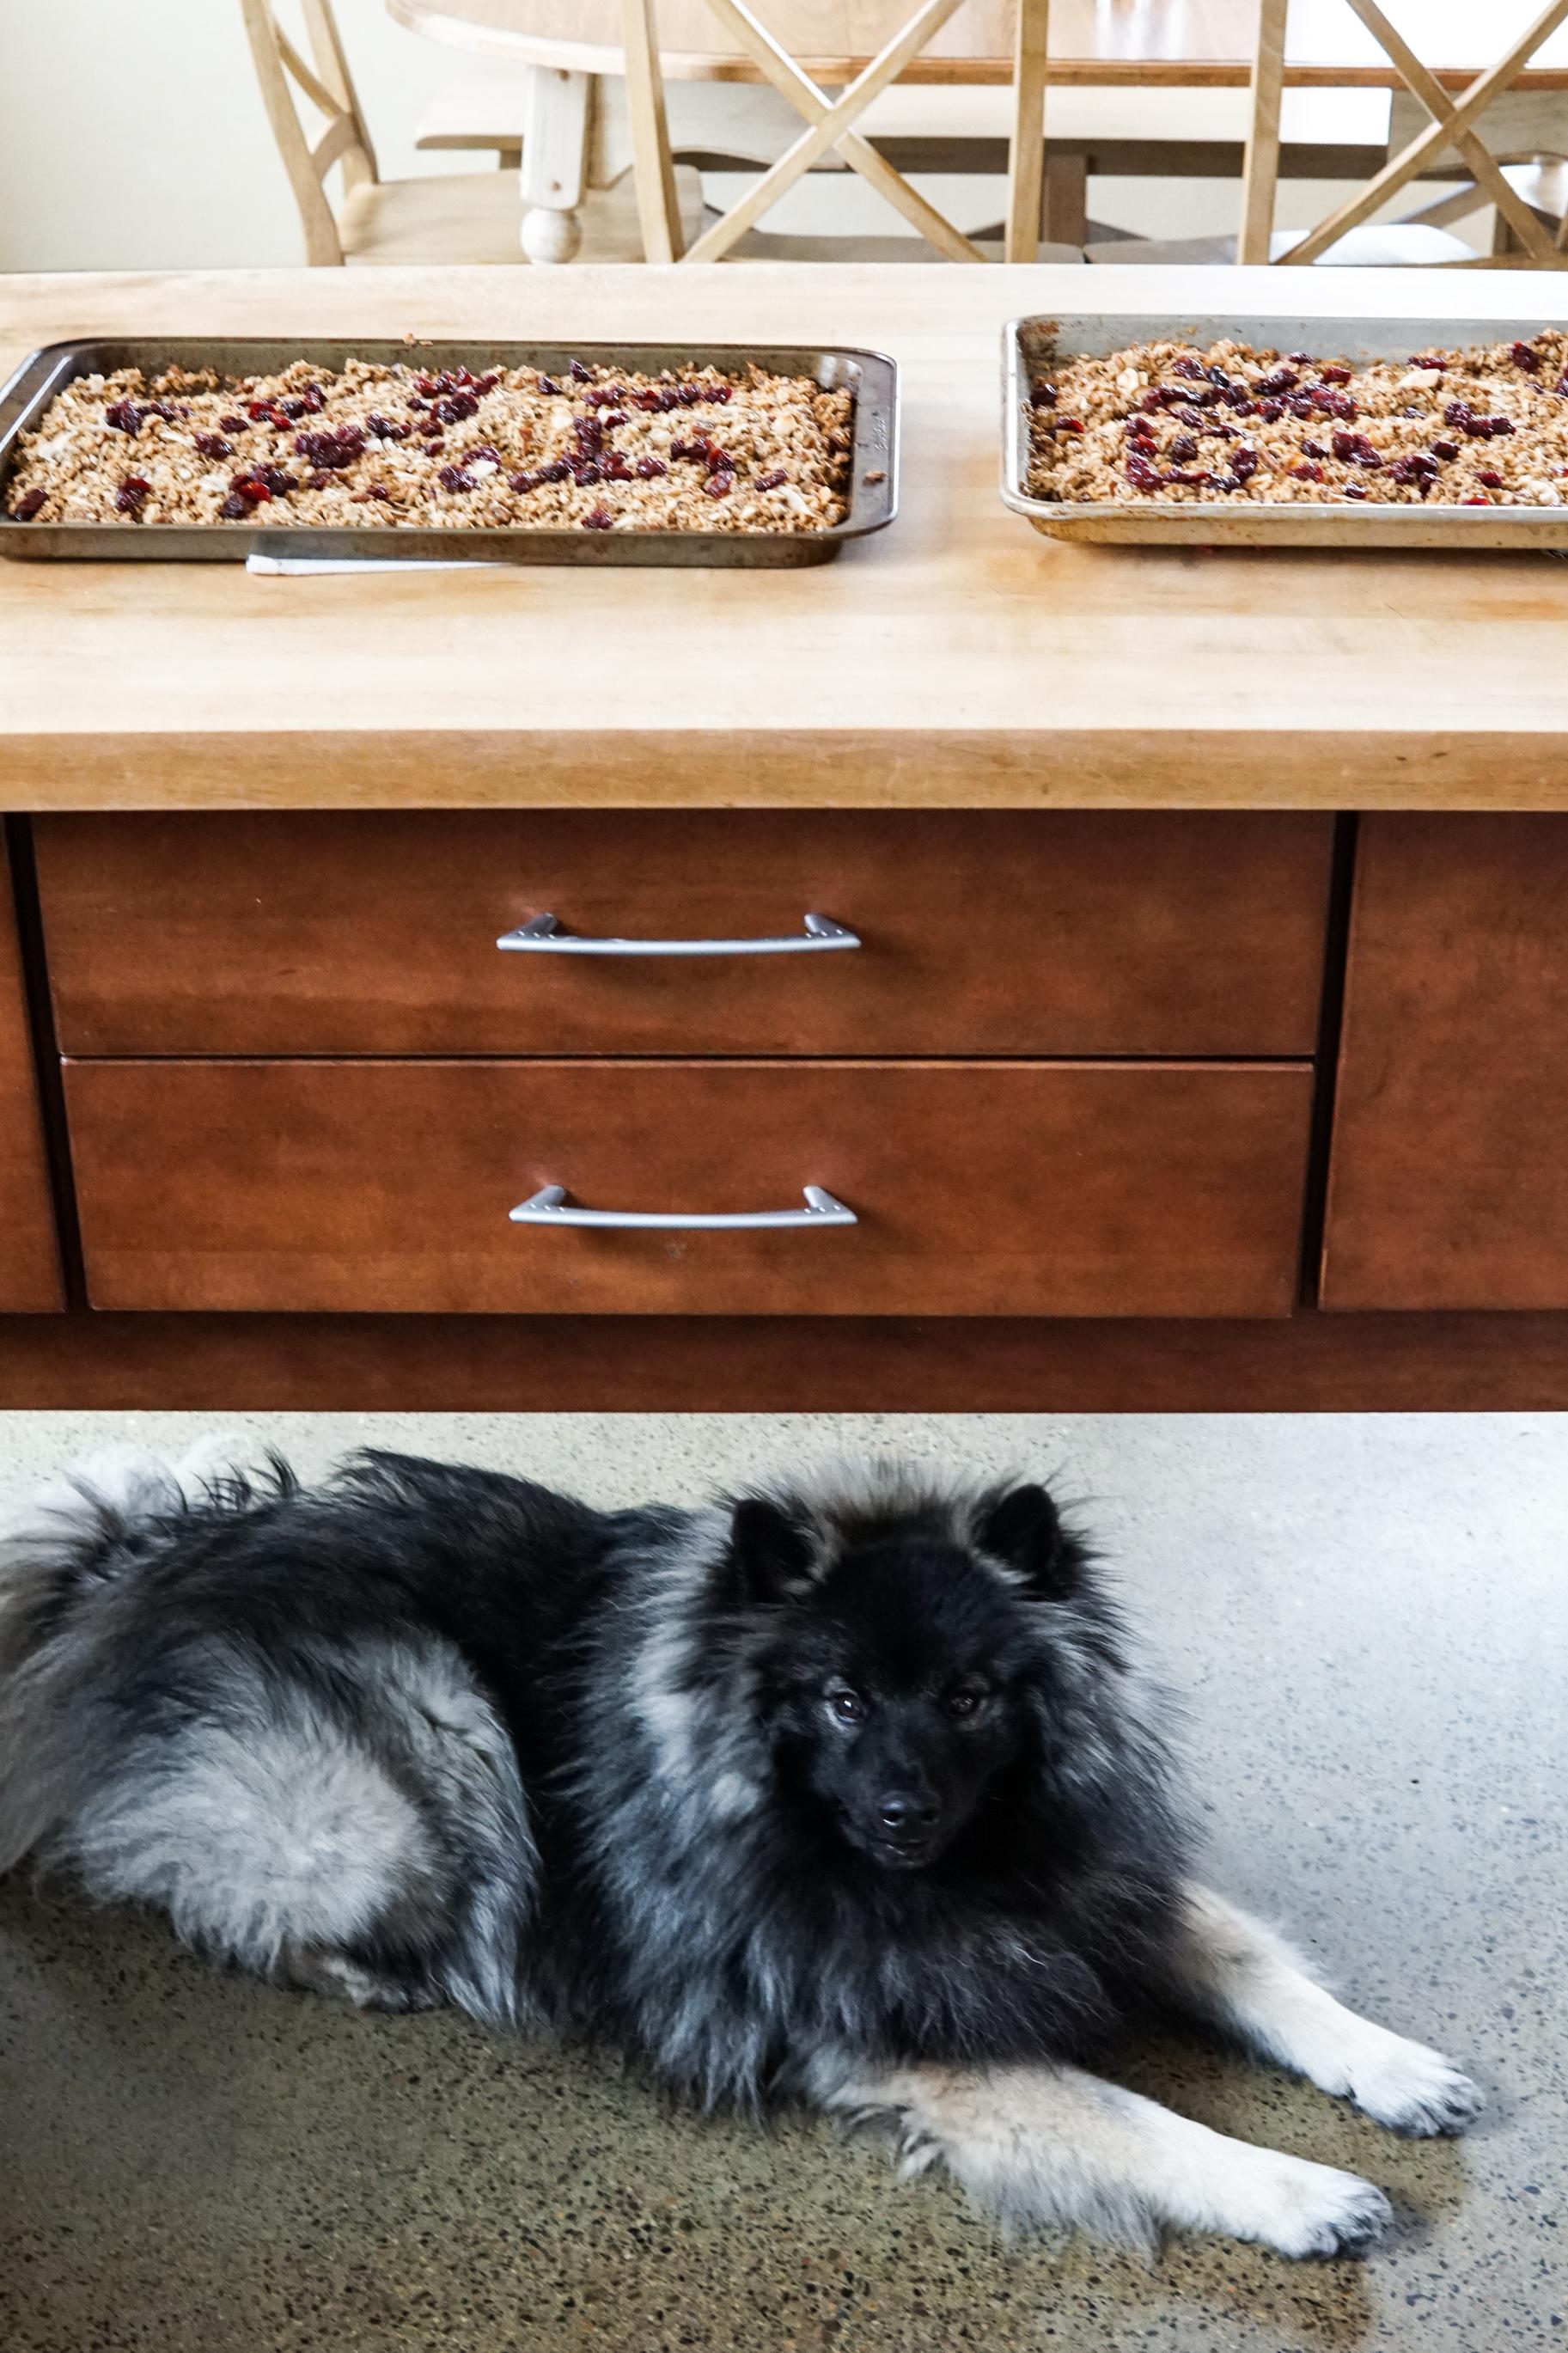 Gambit guards the granola.